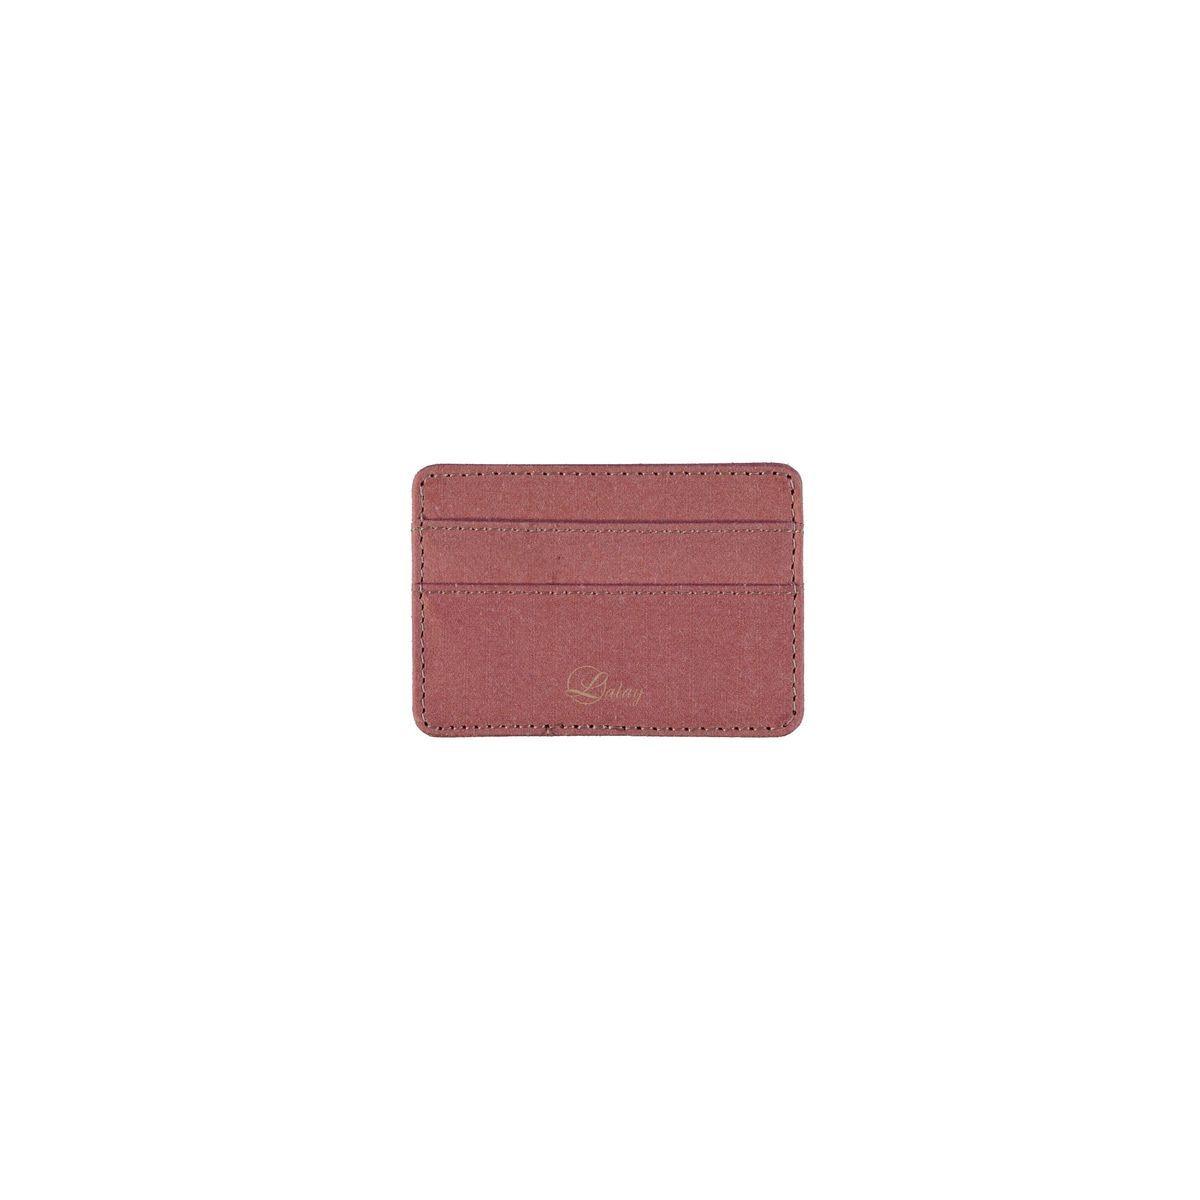 Cardholder Leather / Dusty Rose